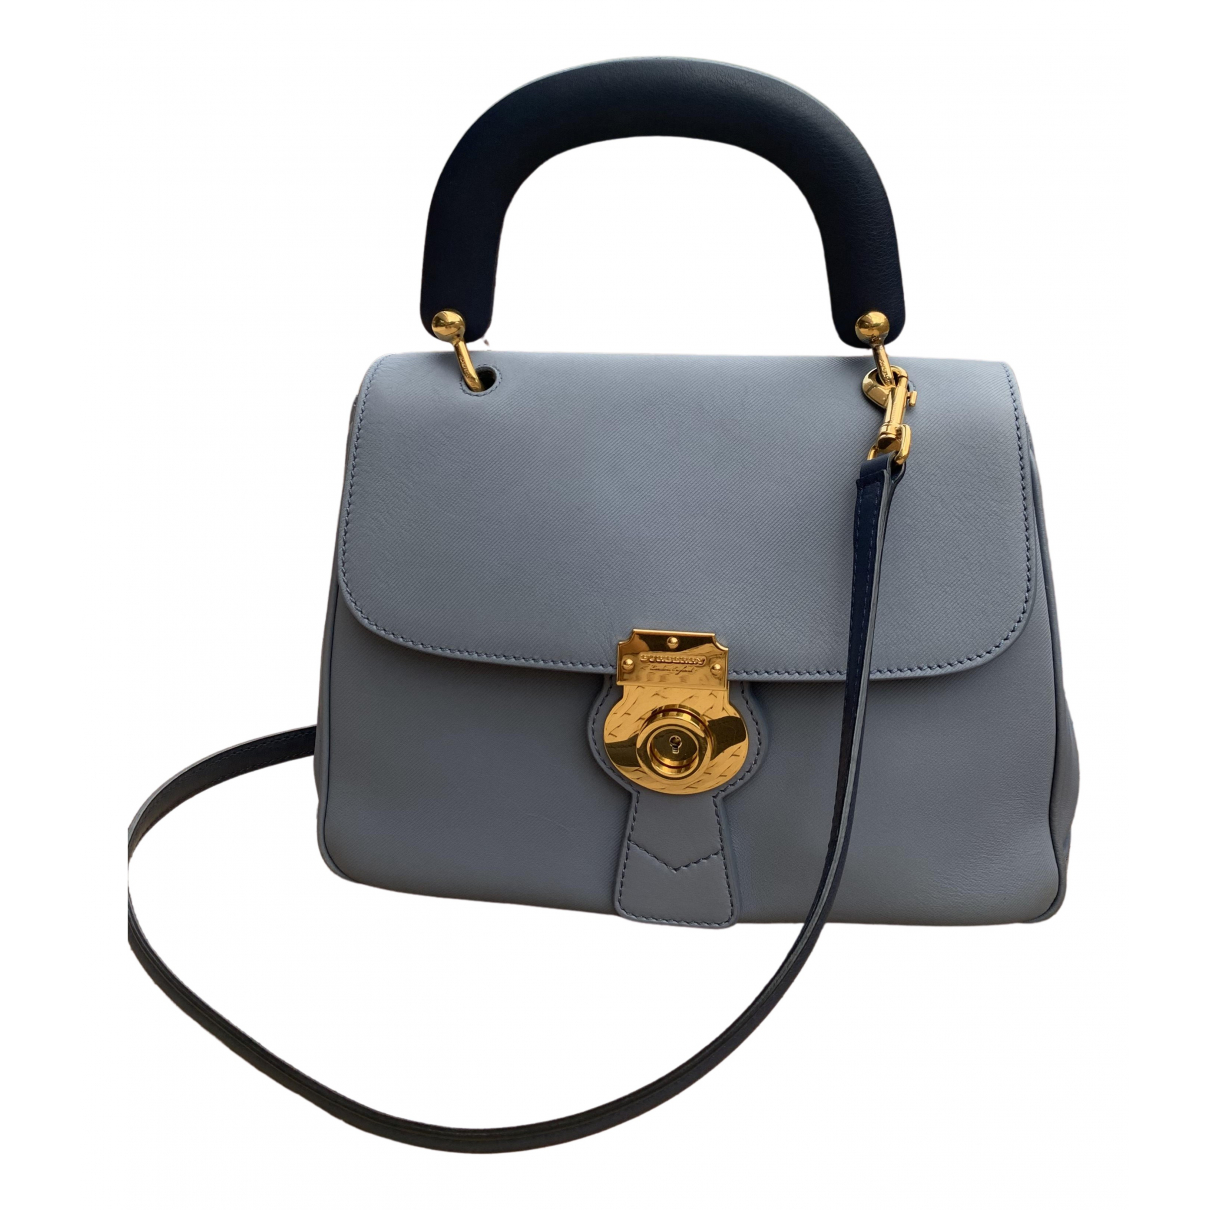 Burberry - Sac a main DK 88 pour femme en cuir - bleu